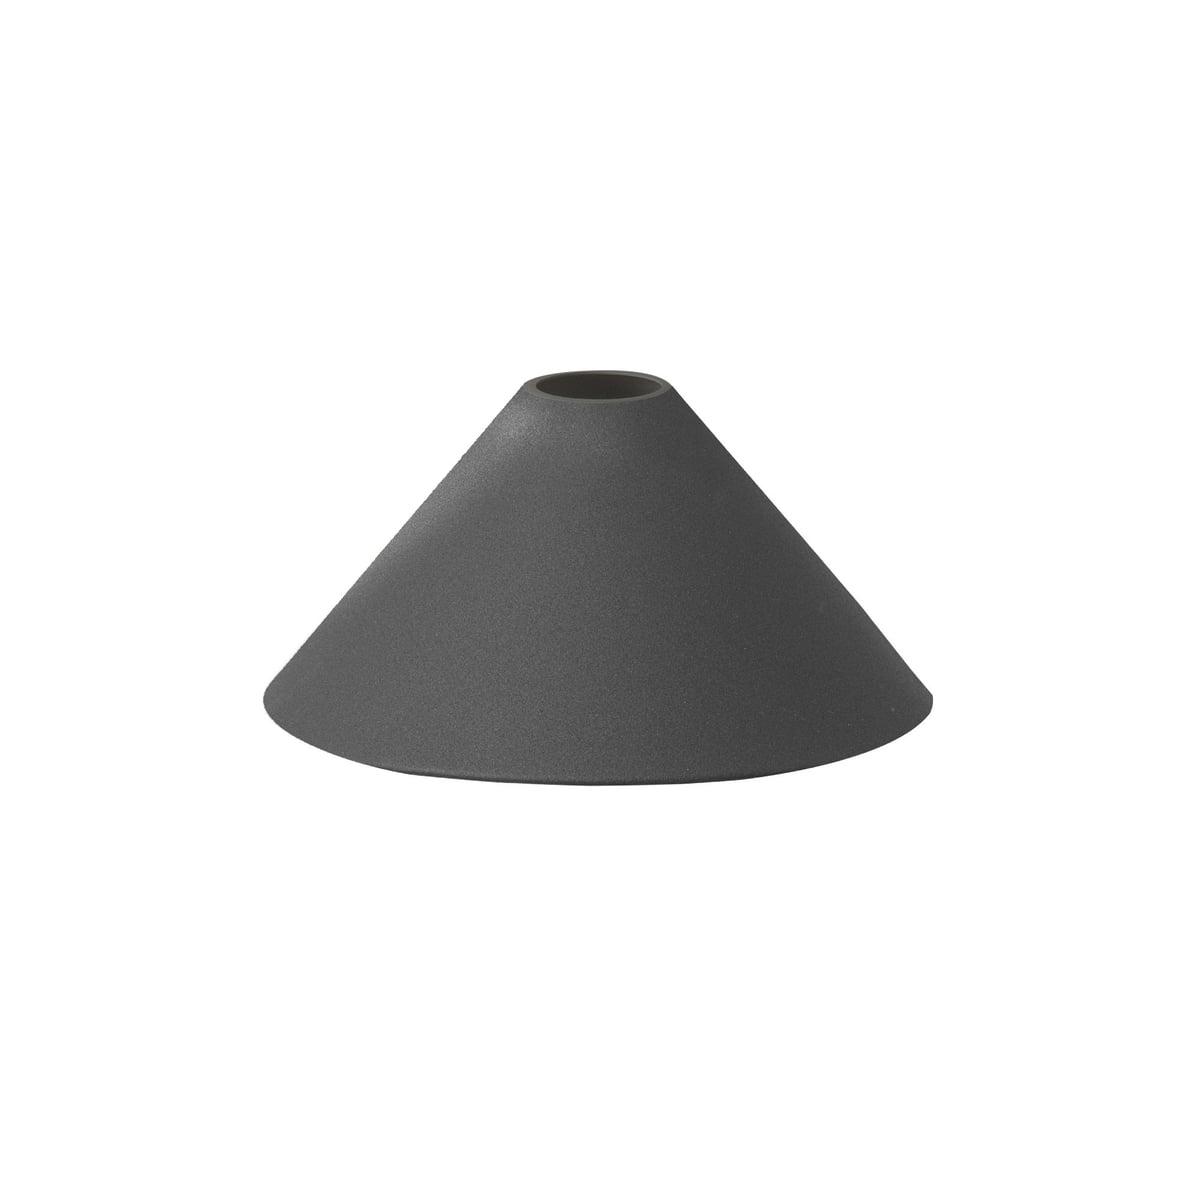 ferm Living - Cone Shade Lampenschirm, schwarz | Lampen > Lampenschirme und Füsse | Schwarz | ferm living